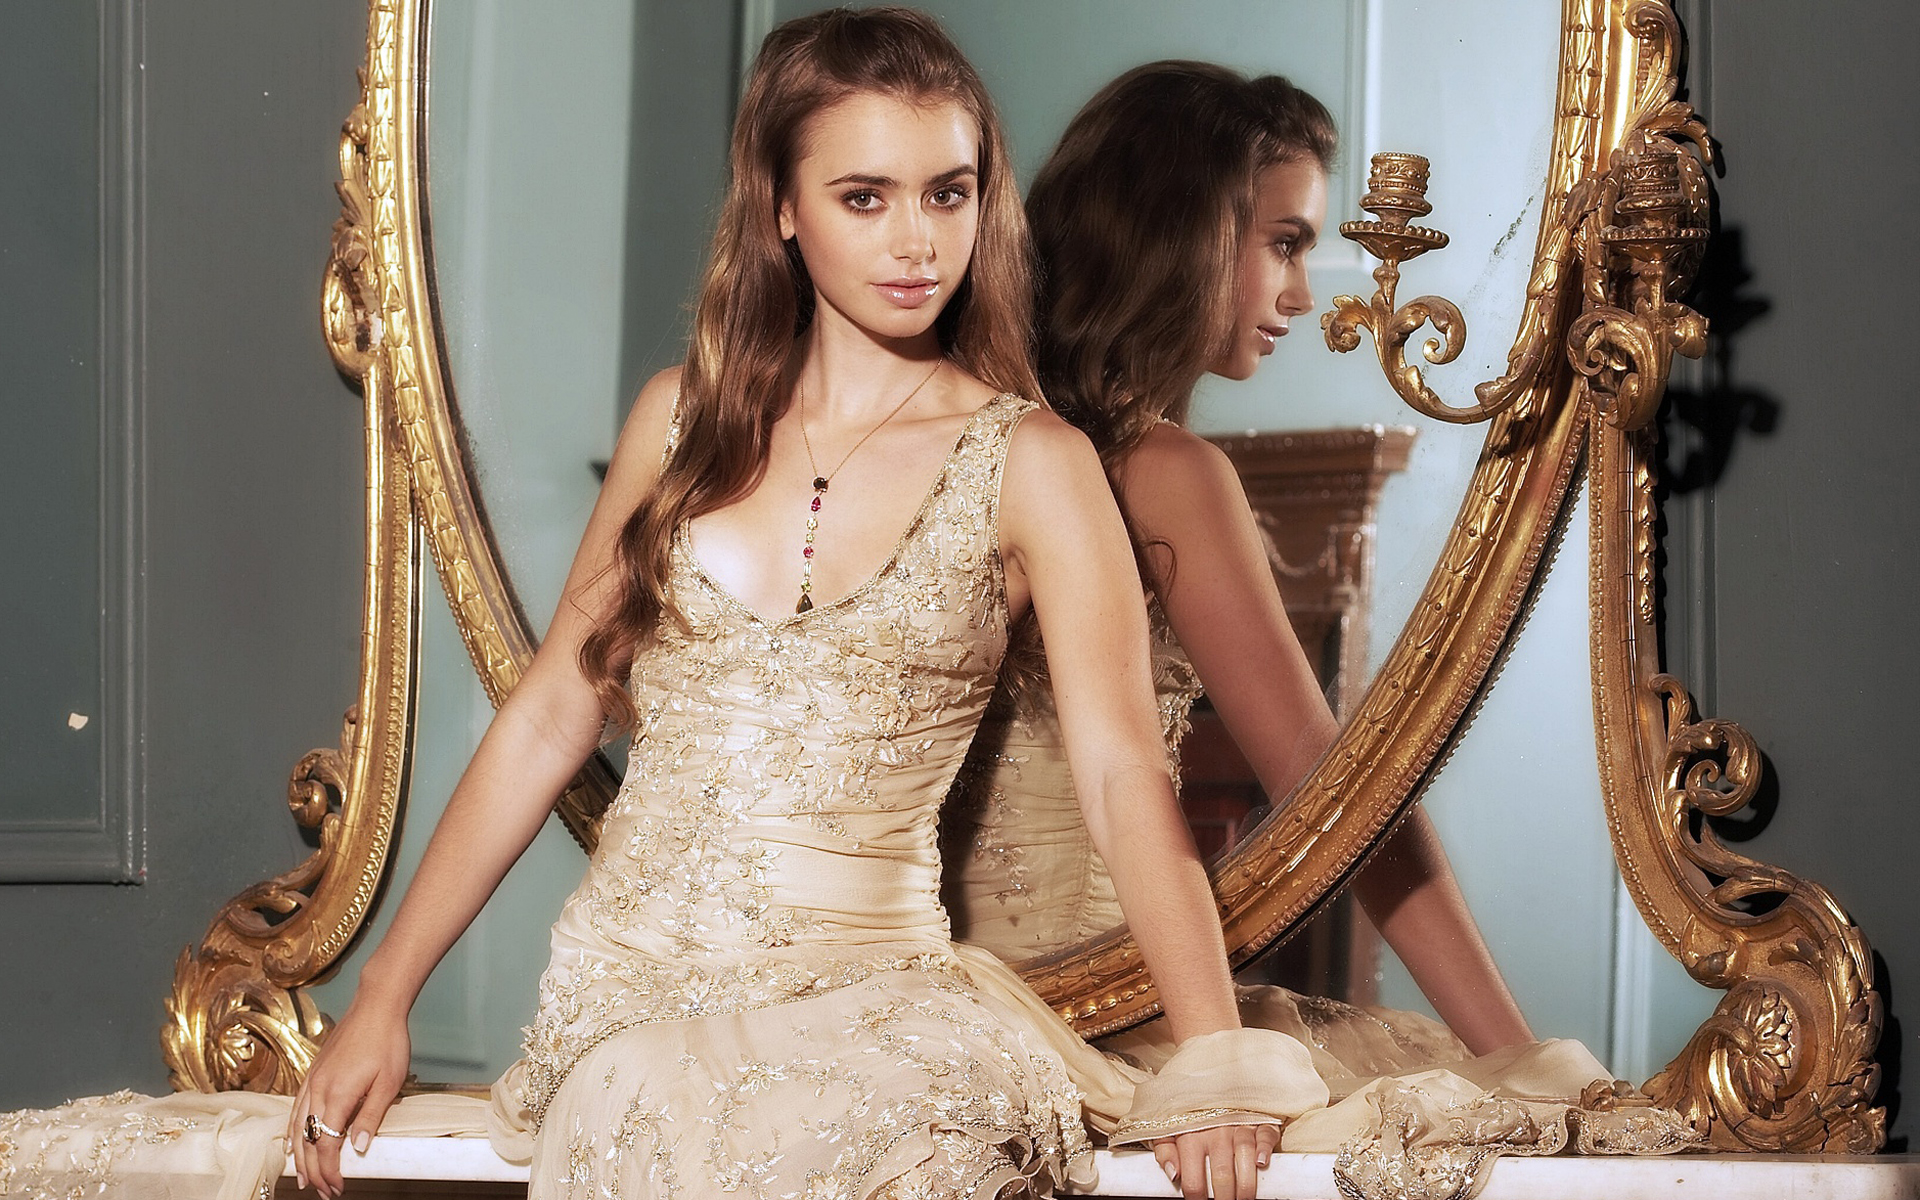 красивая девушка у зеркала код